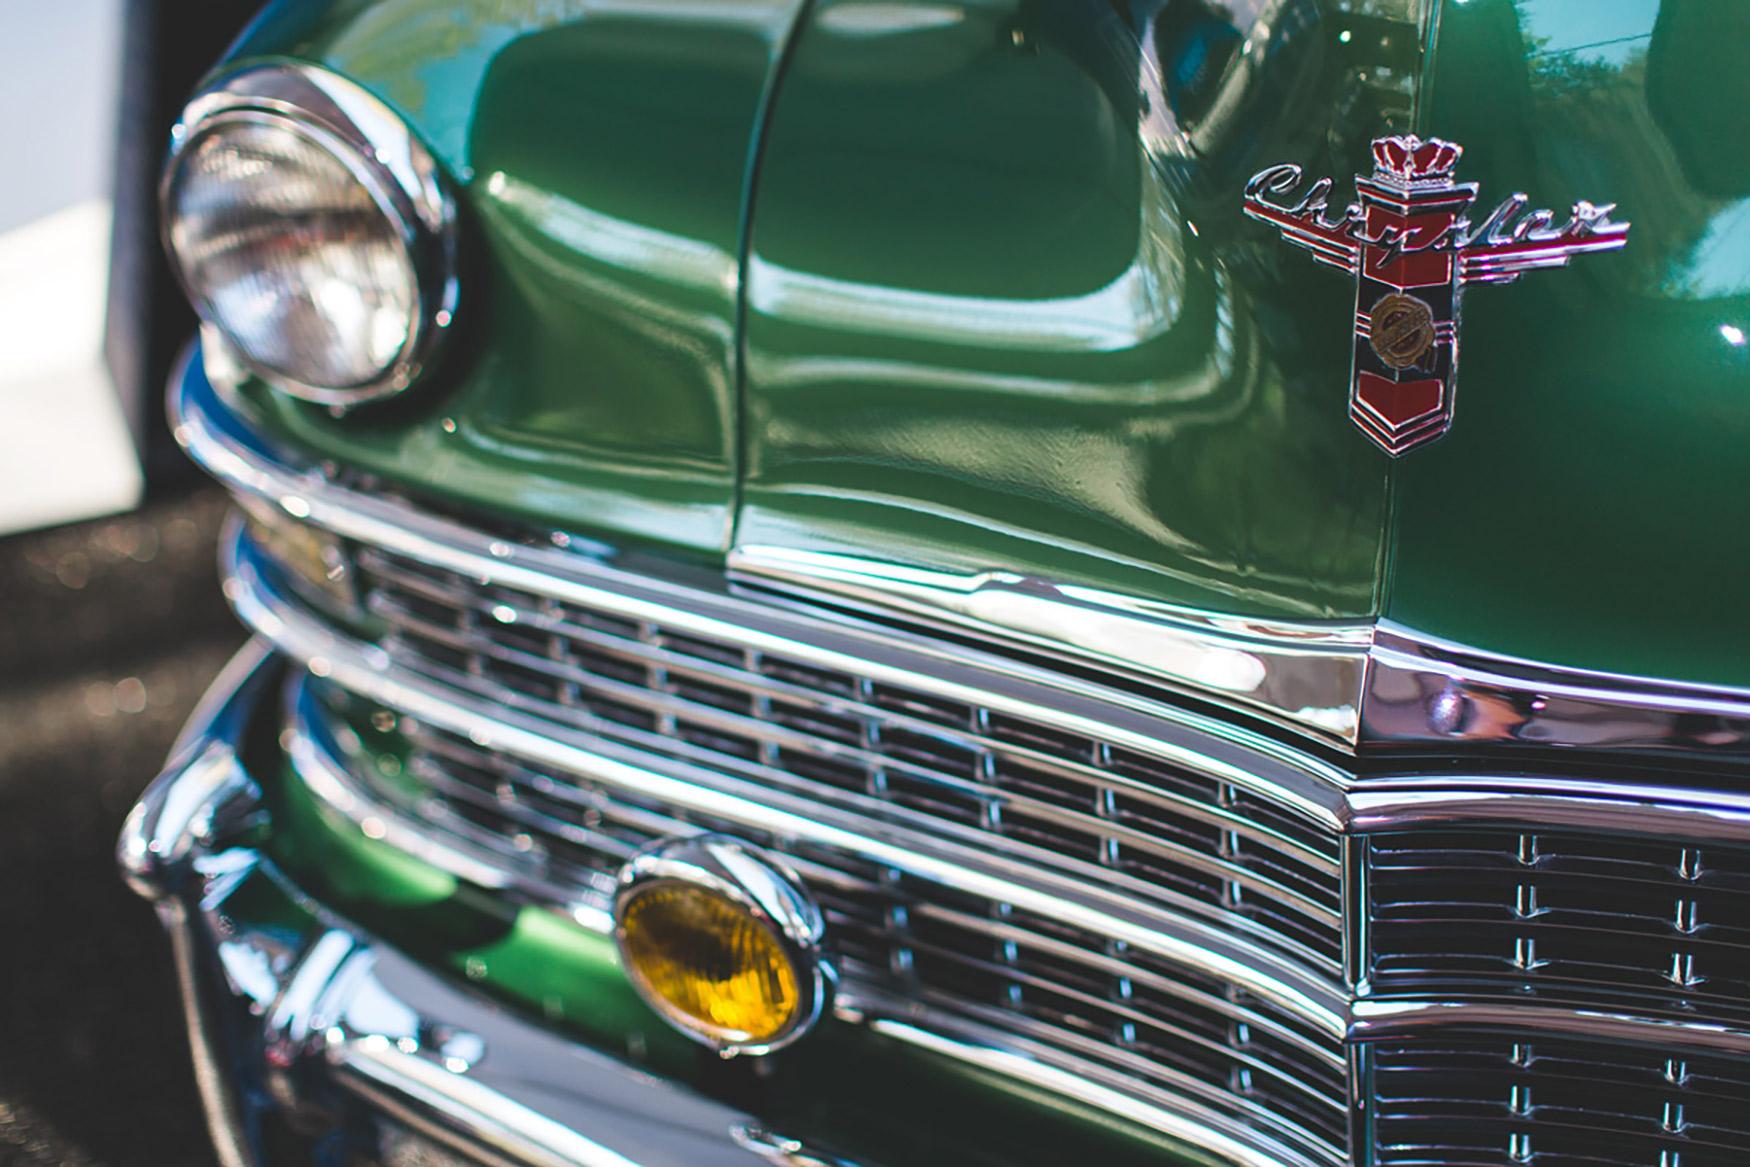 car-show-3.jpg